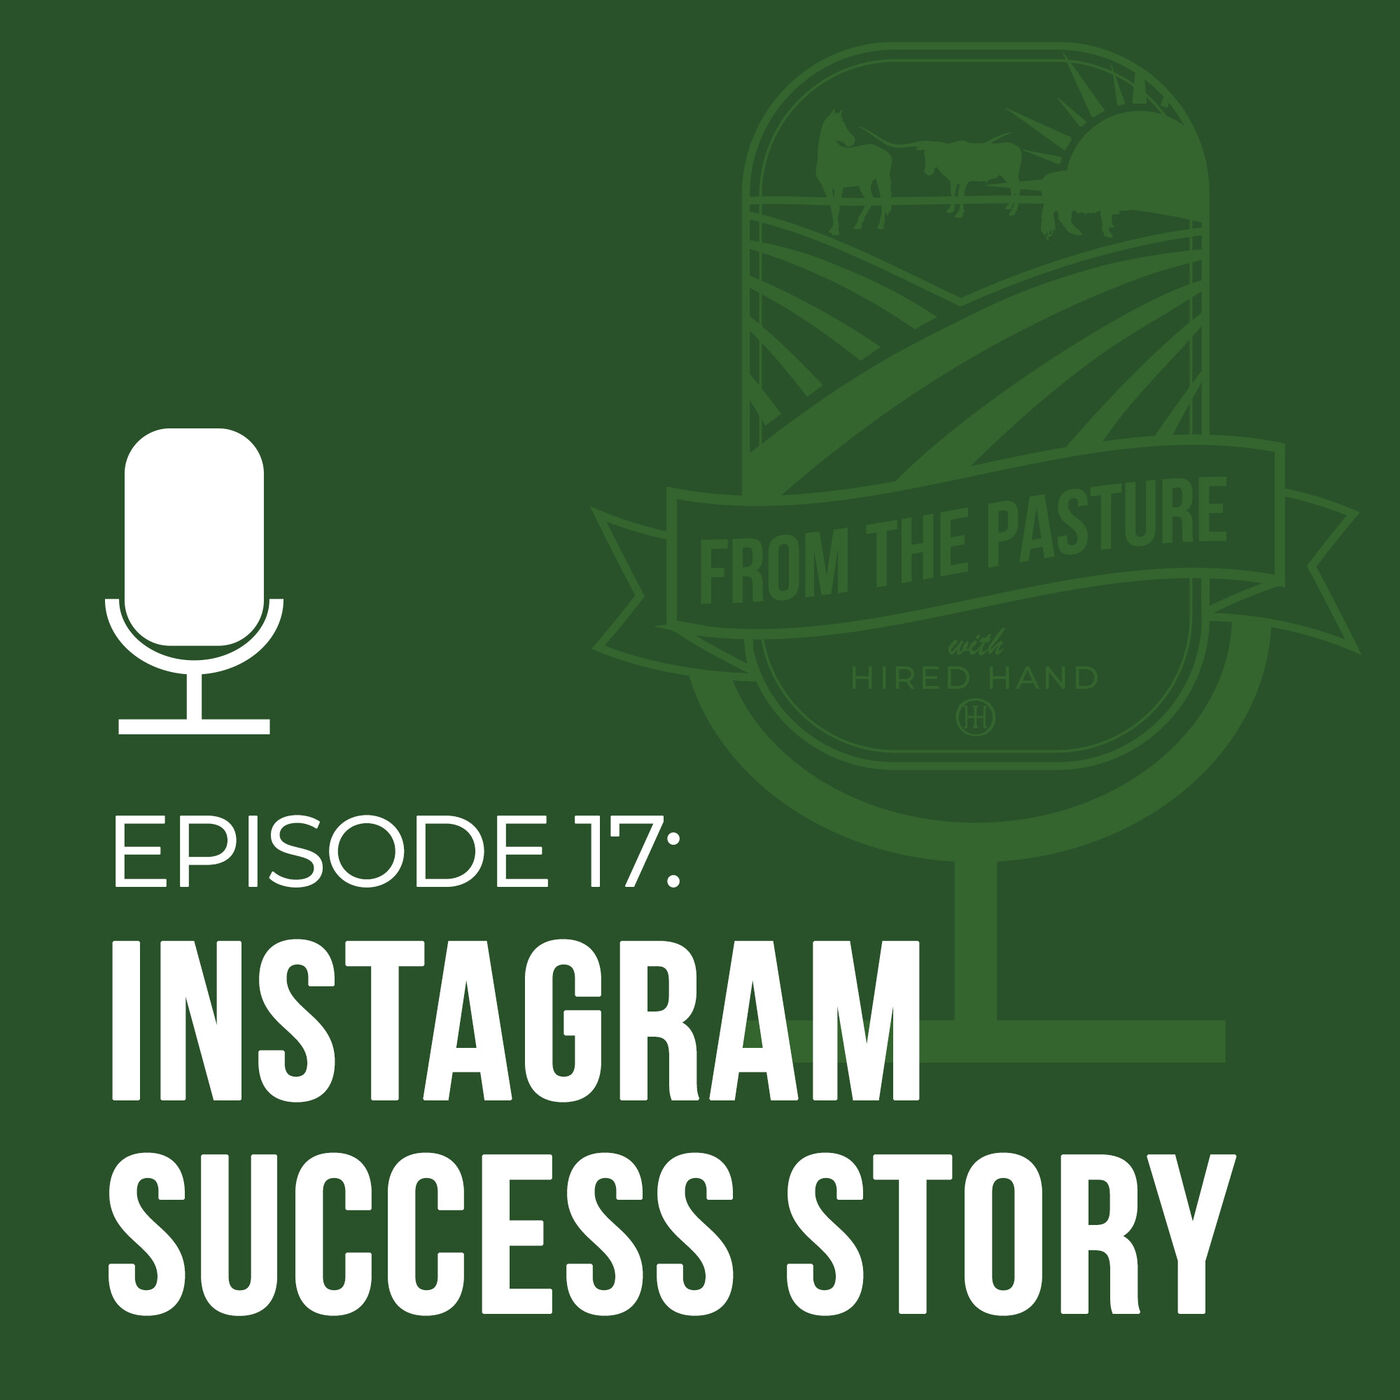 An Instagram Success Story